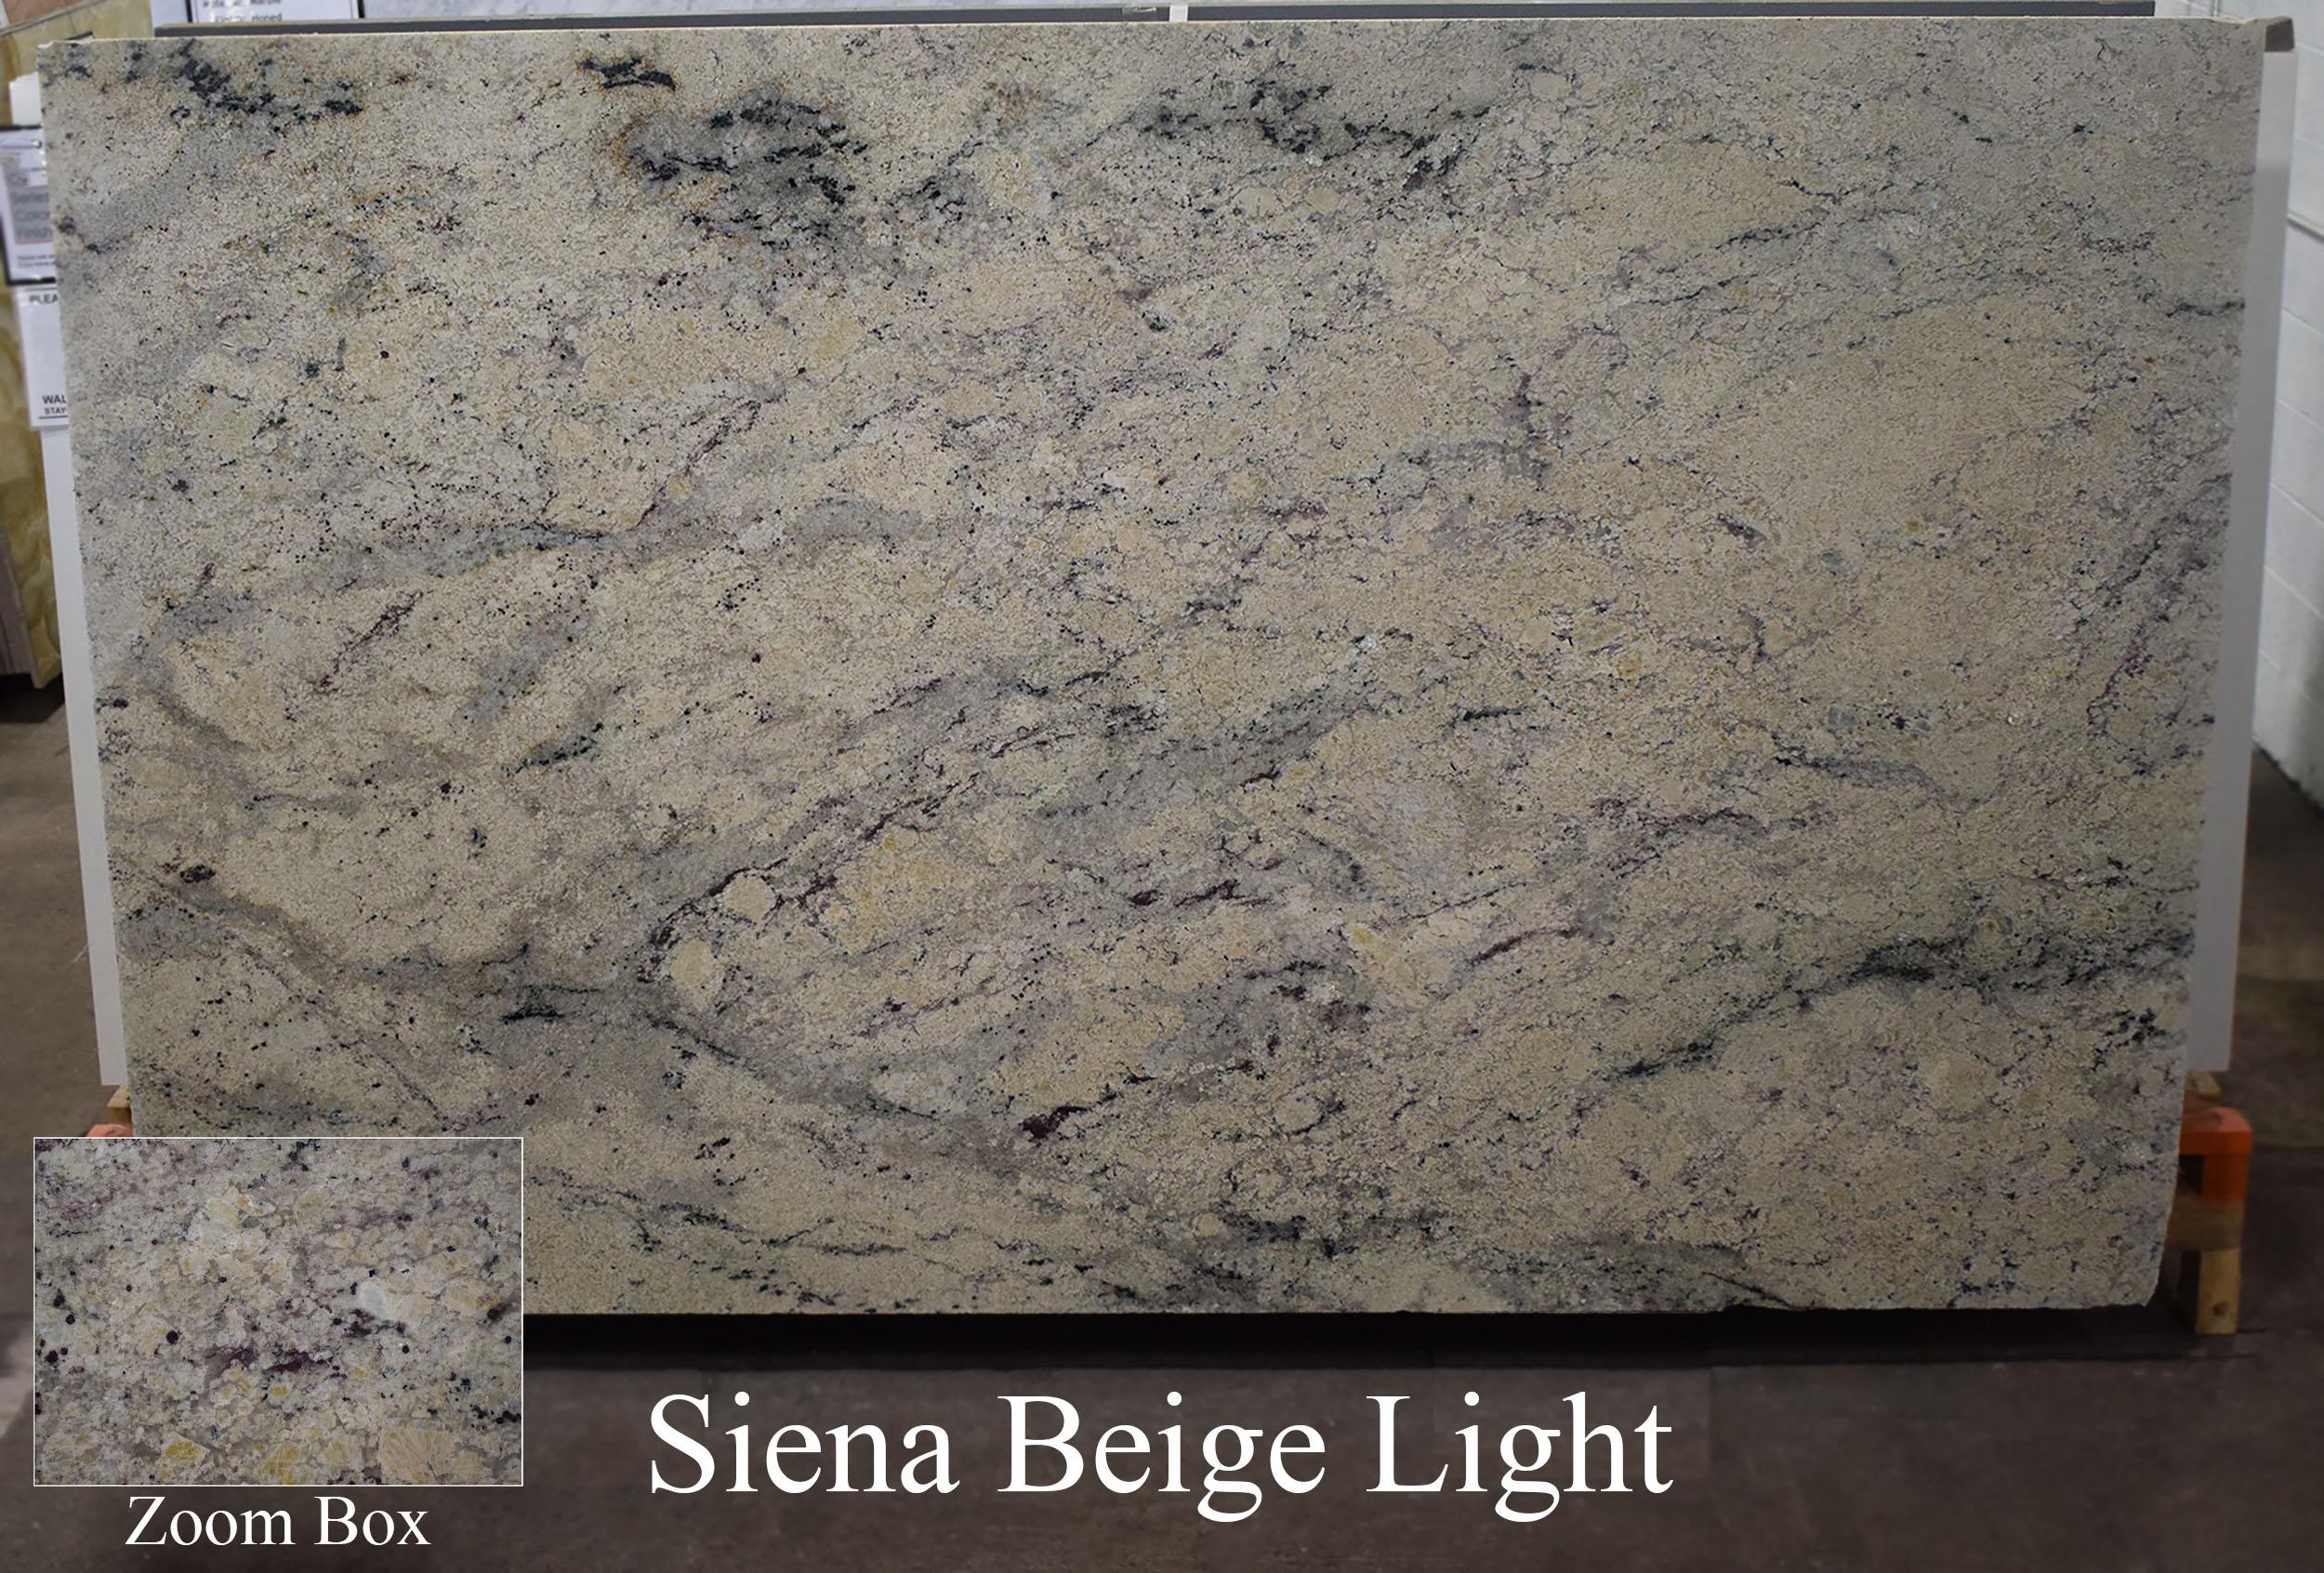 SIENA BEIGE LIGHT